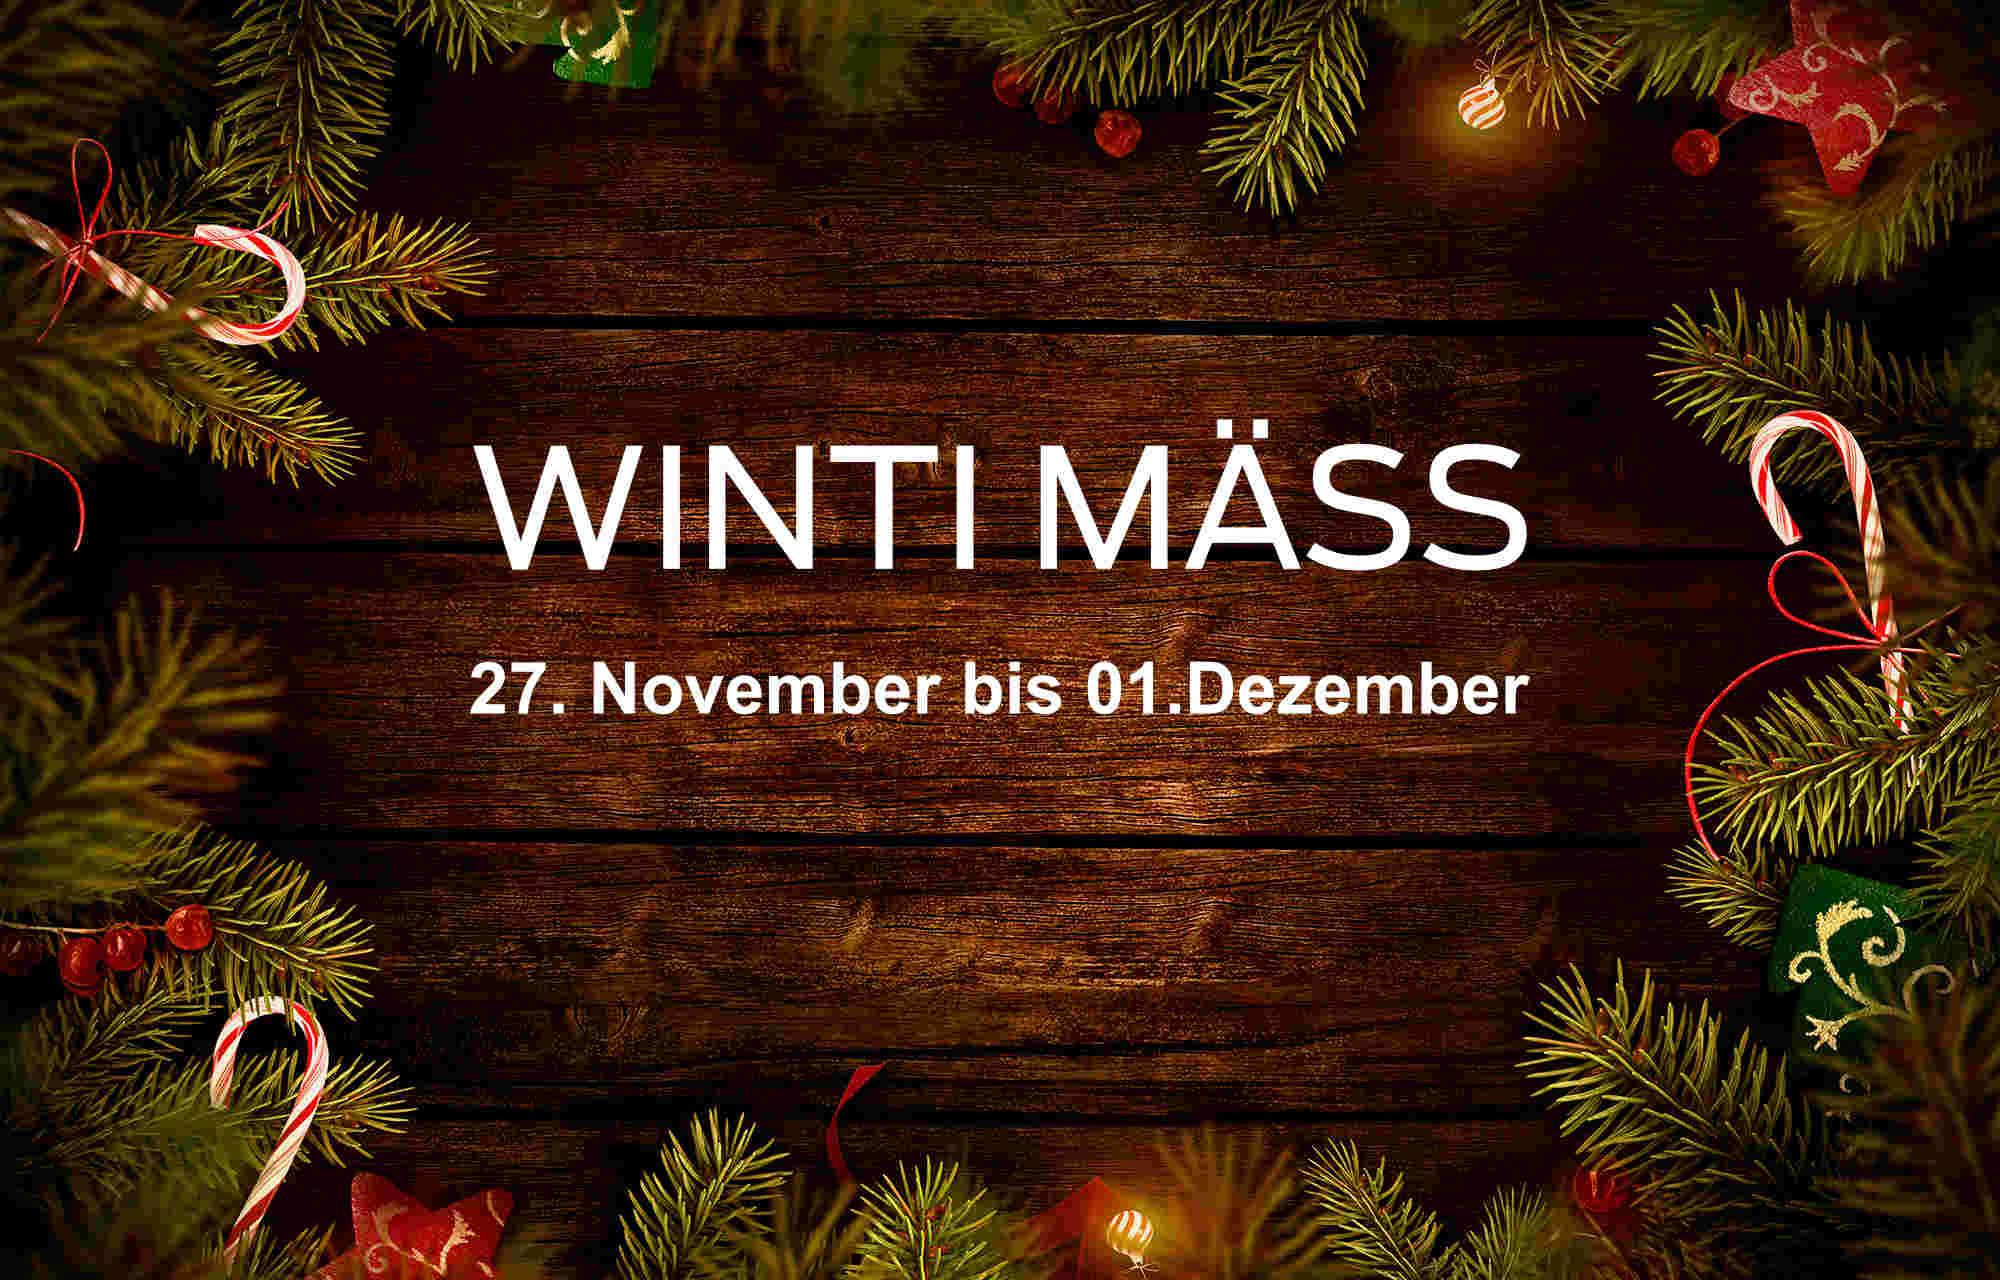 Winti Mäss 27. November bis 01. Dezember